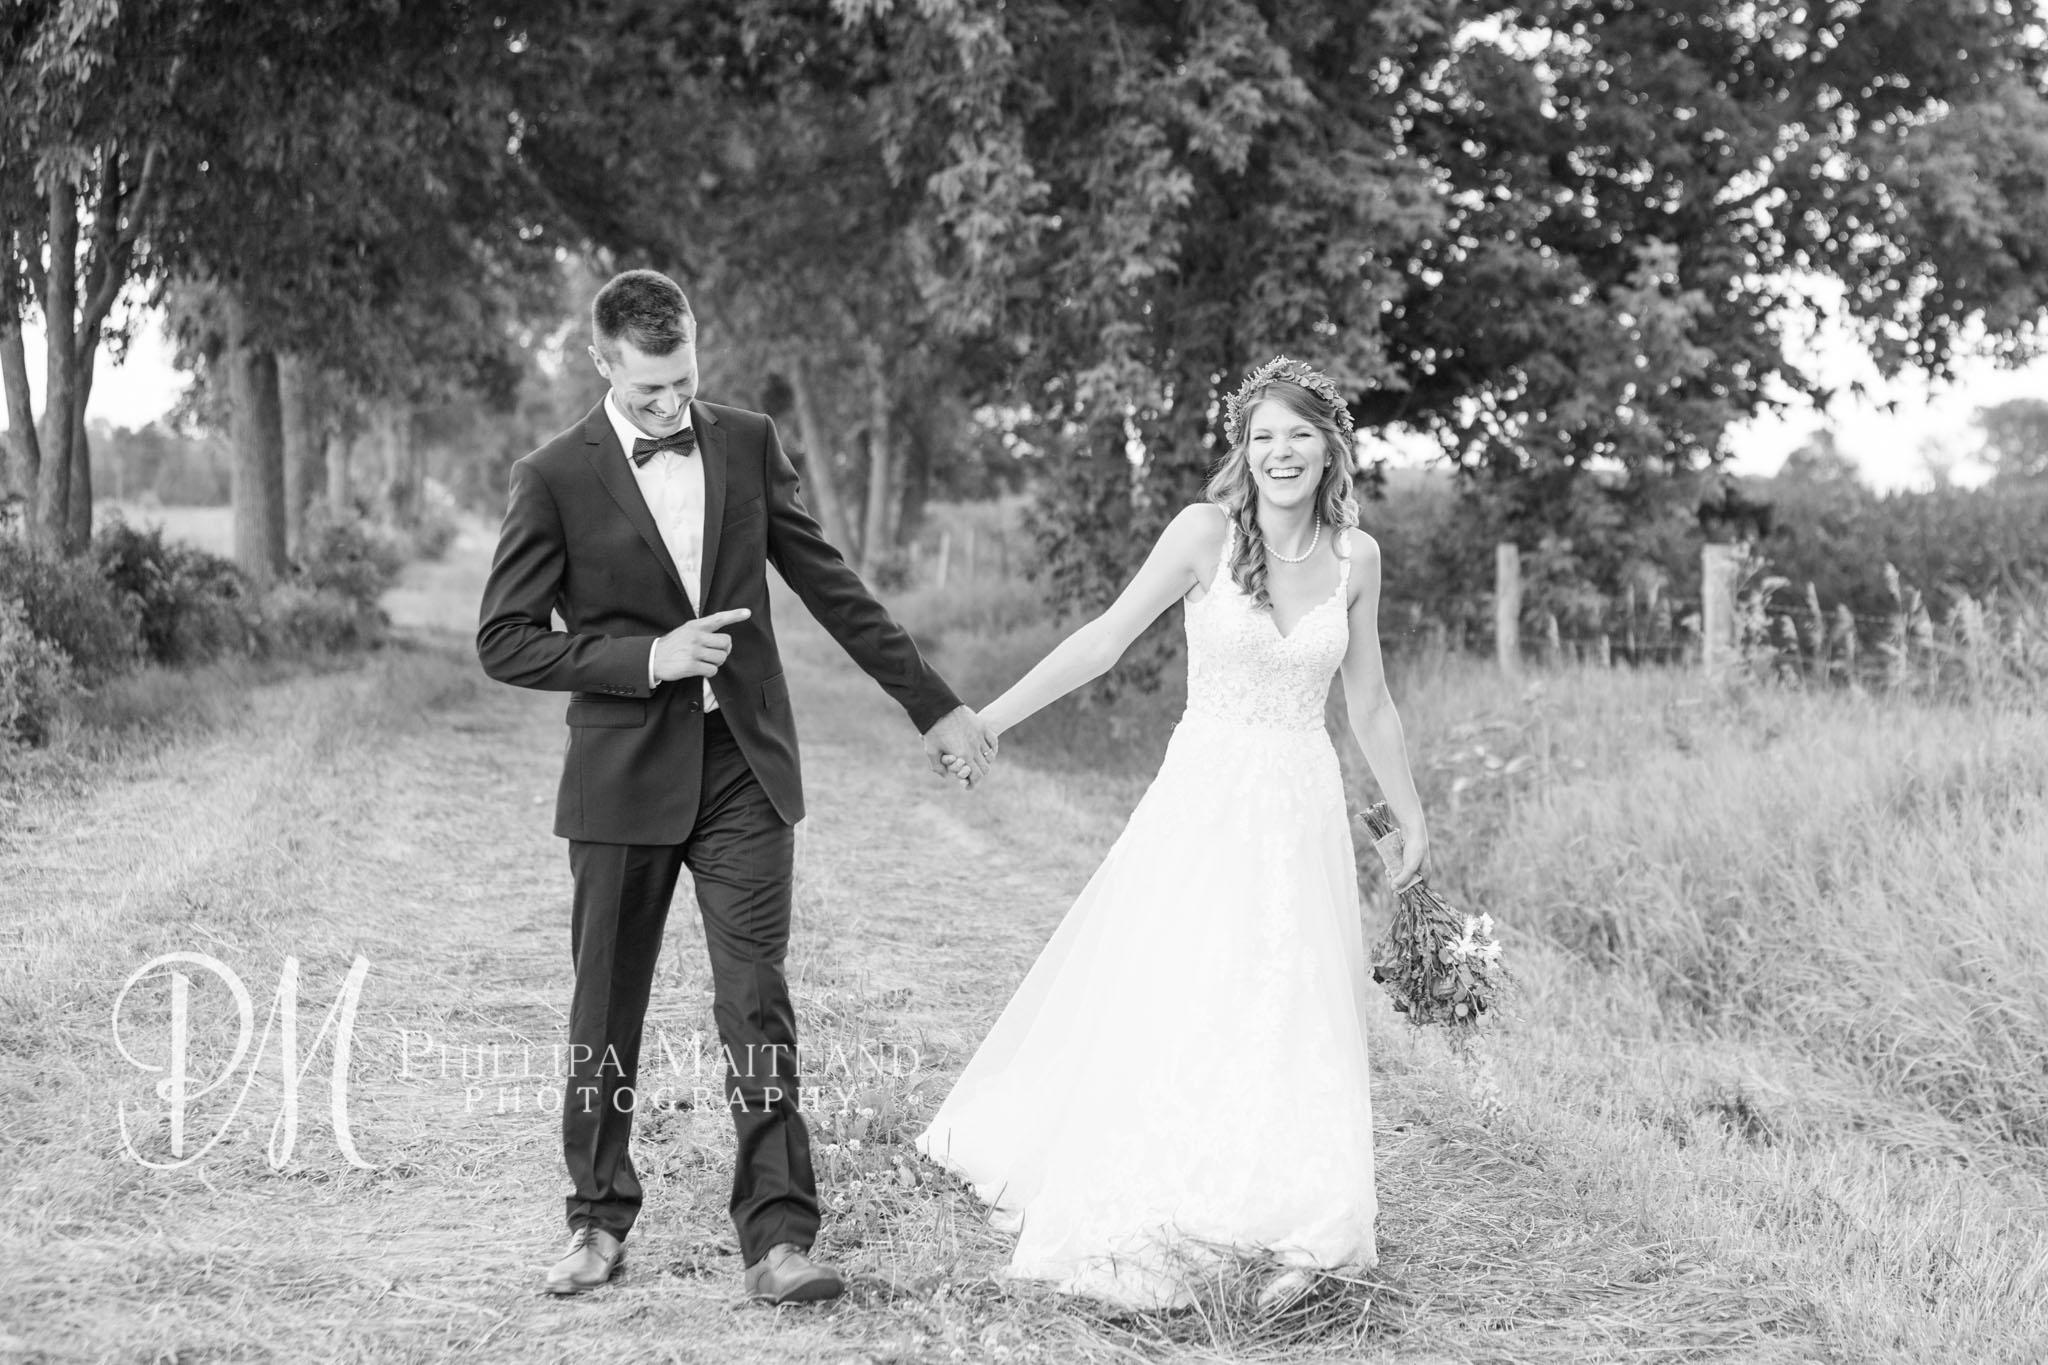 winchester wedding (3).jpg